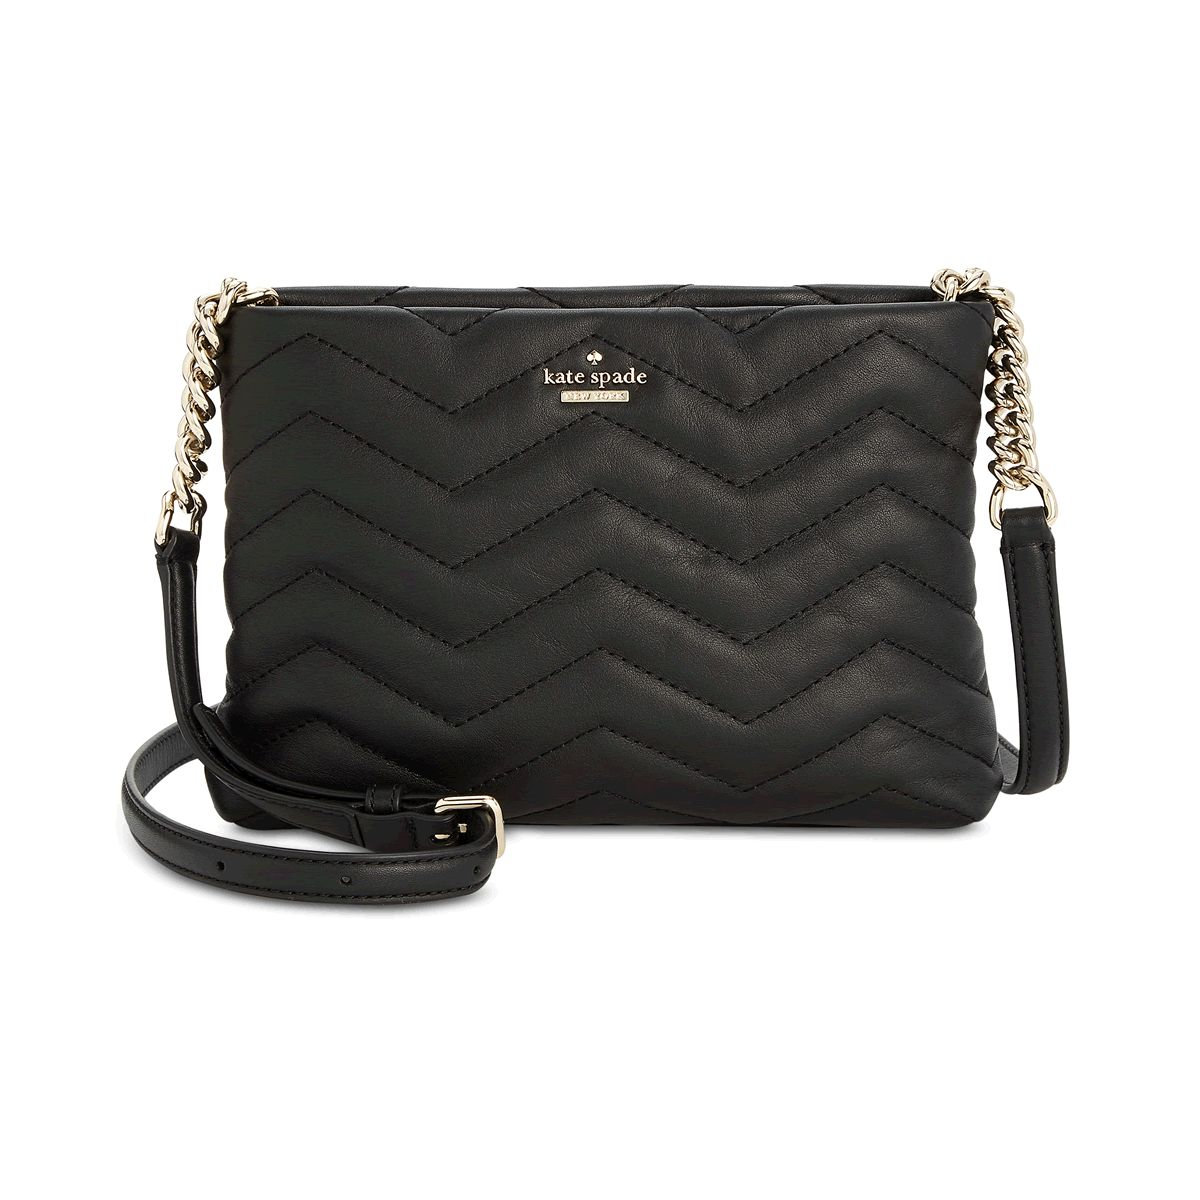 0215b5e1a1d Designer Handbags - Macy s